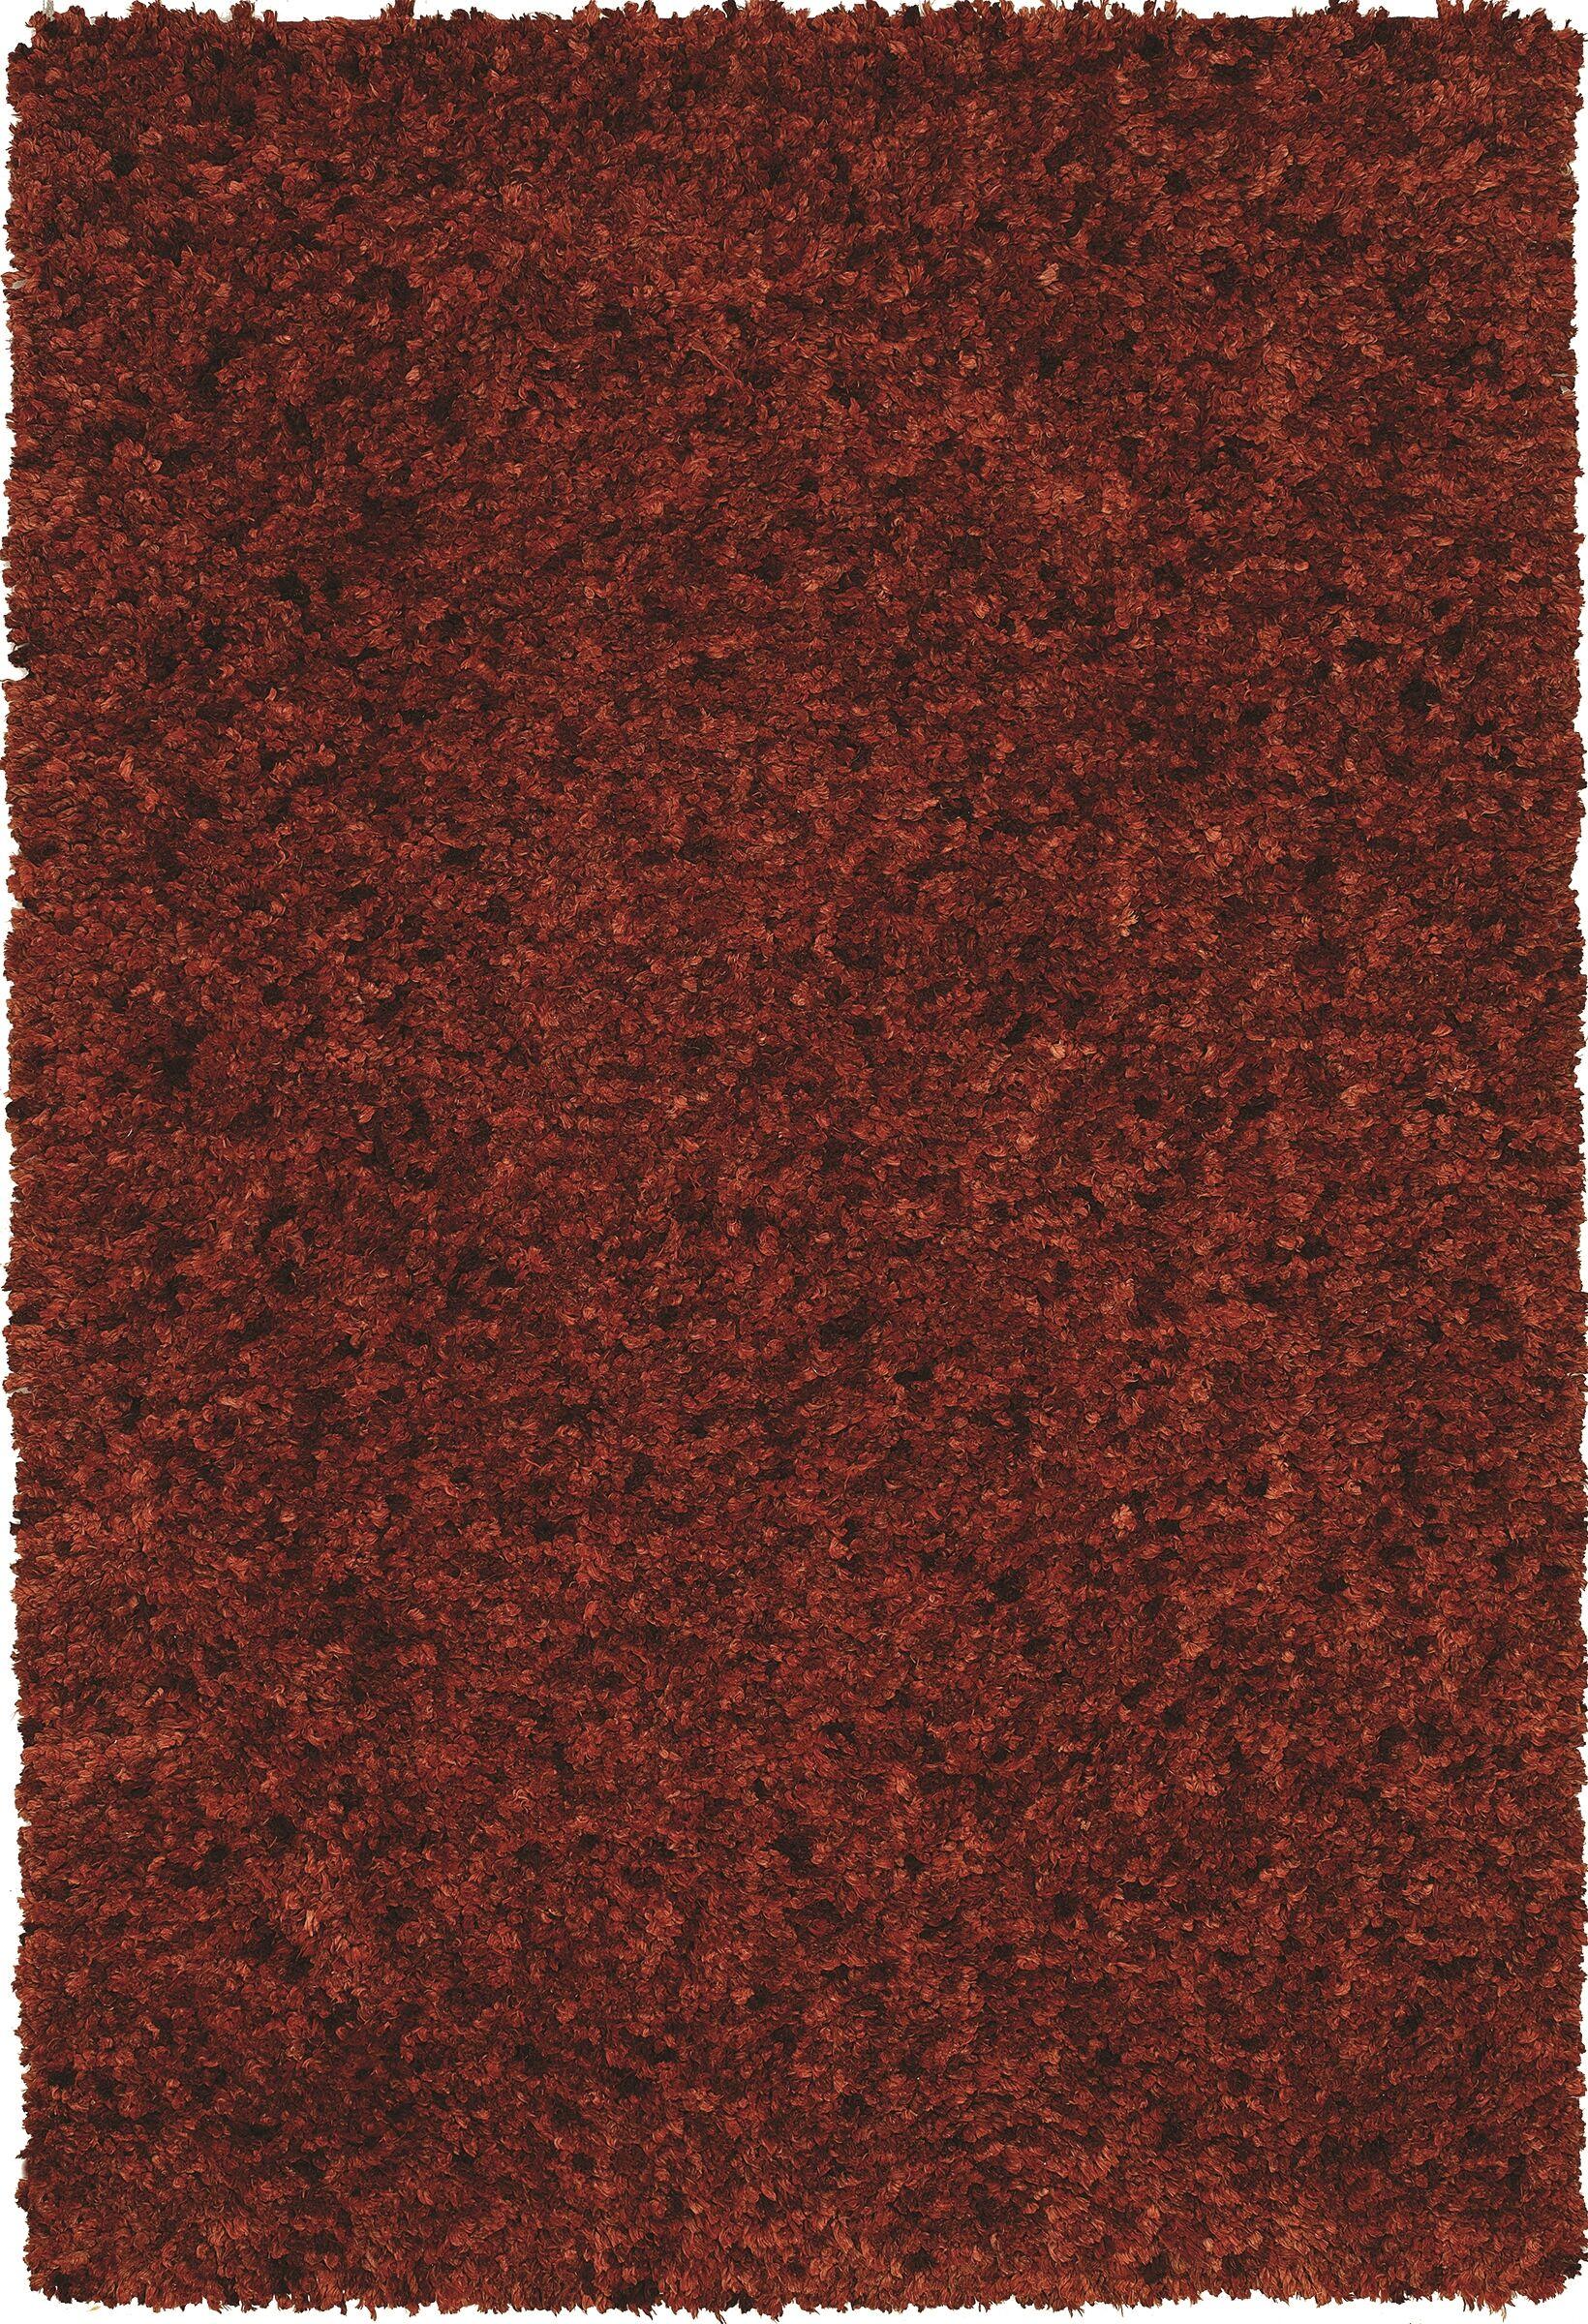 Tyreek Terra Cotta Area Rug Rug Size: Rectangle 8' x 10'